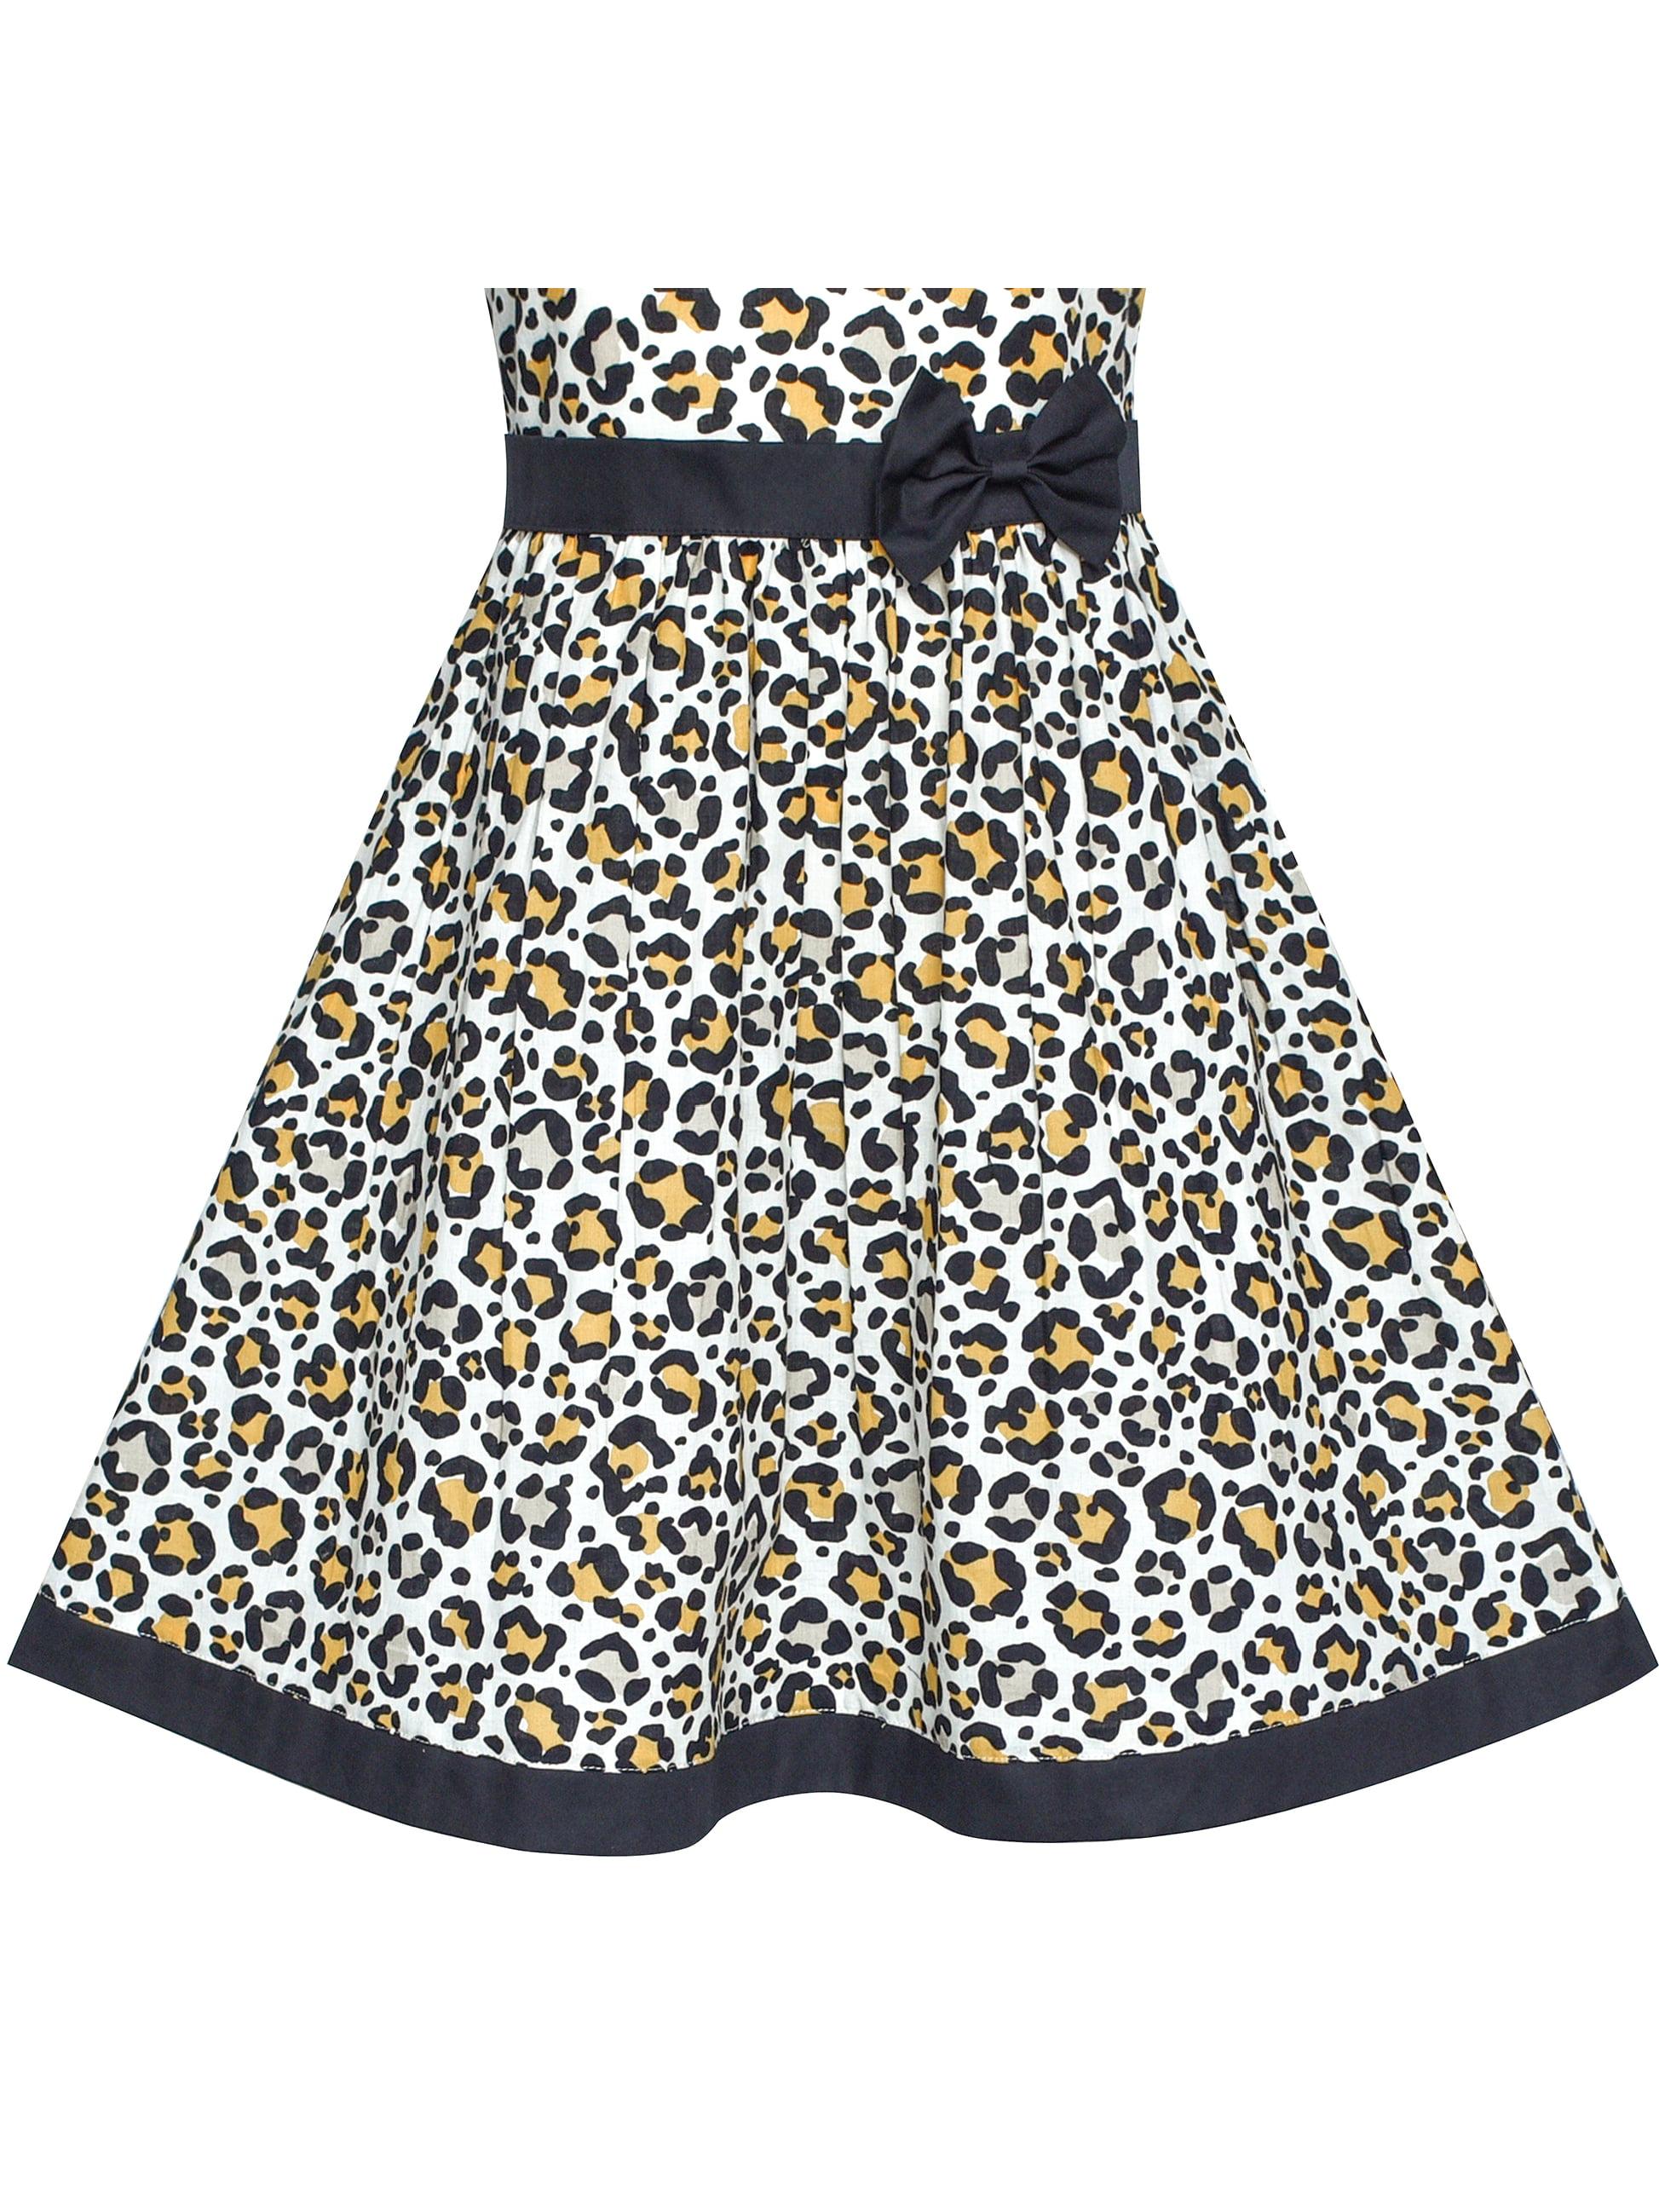 762f51cda Sunny Fashion - Girls Dress Brown Leopard Print Summer Beach ...